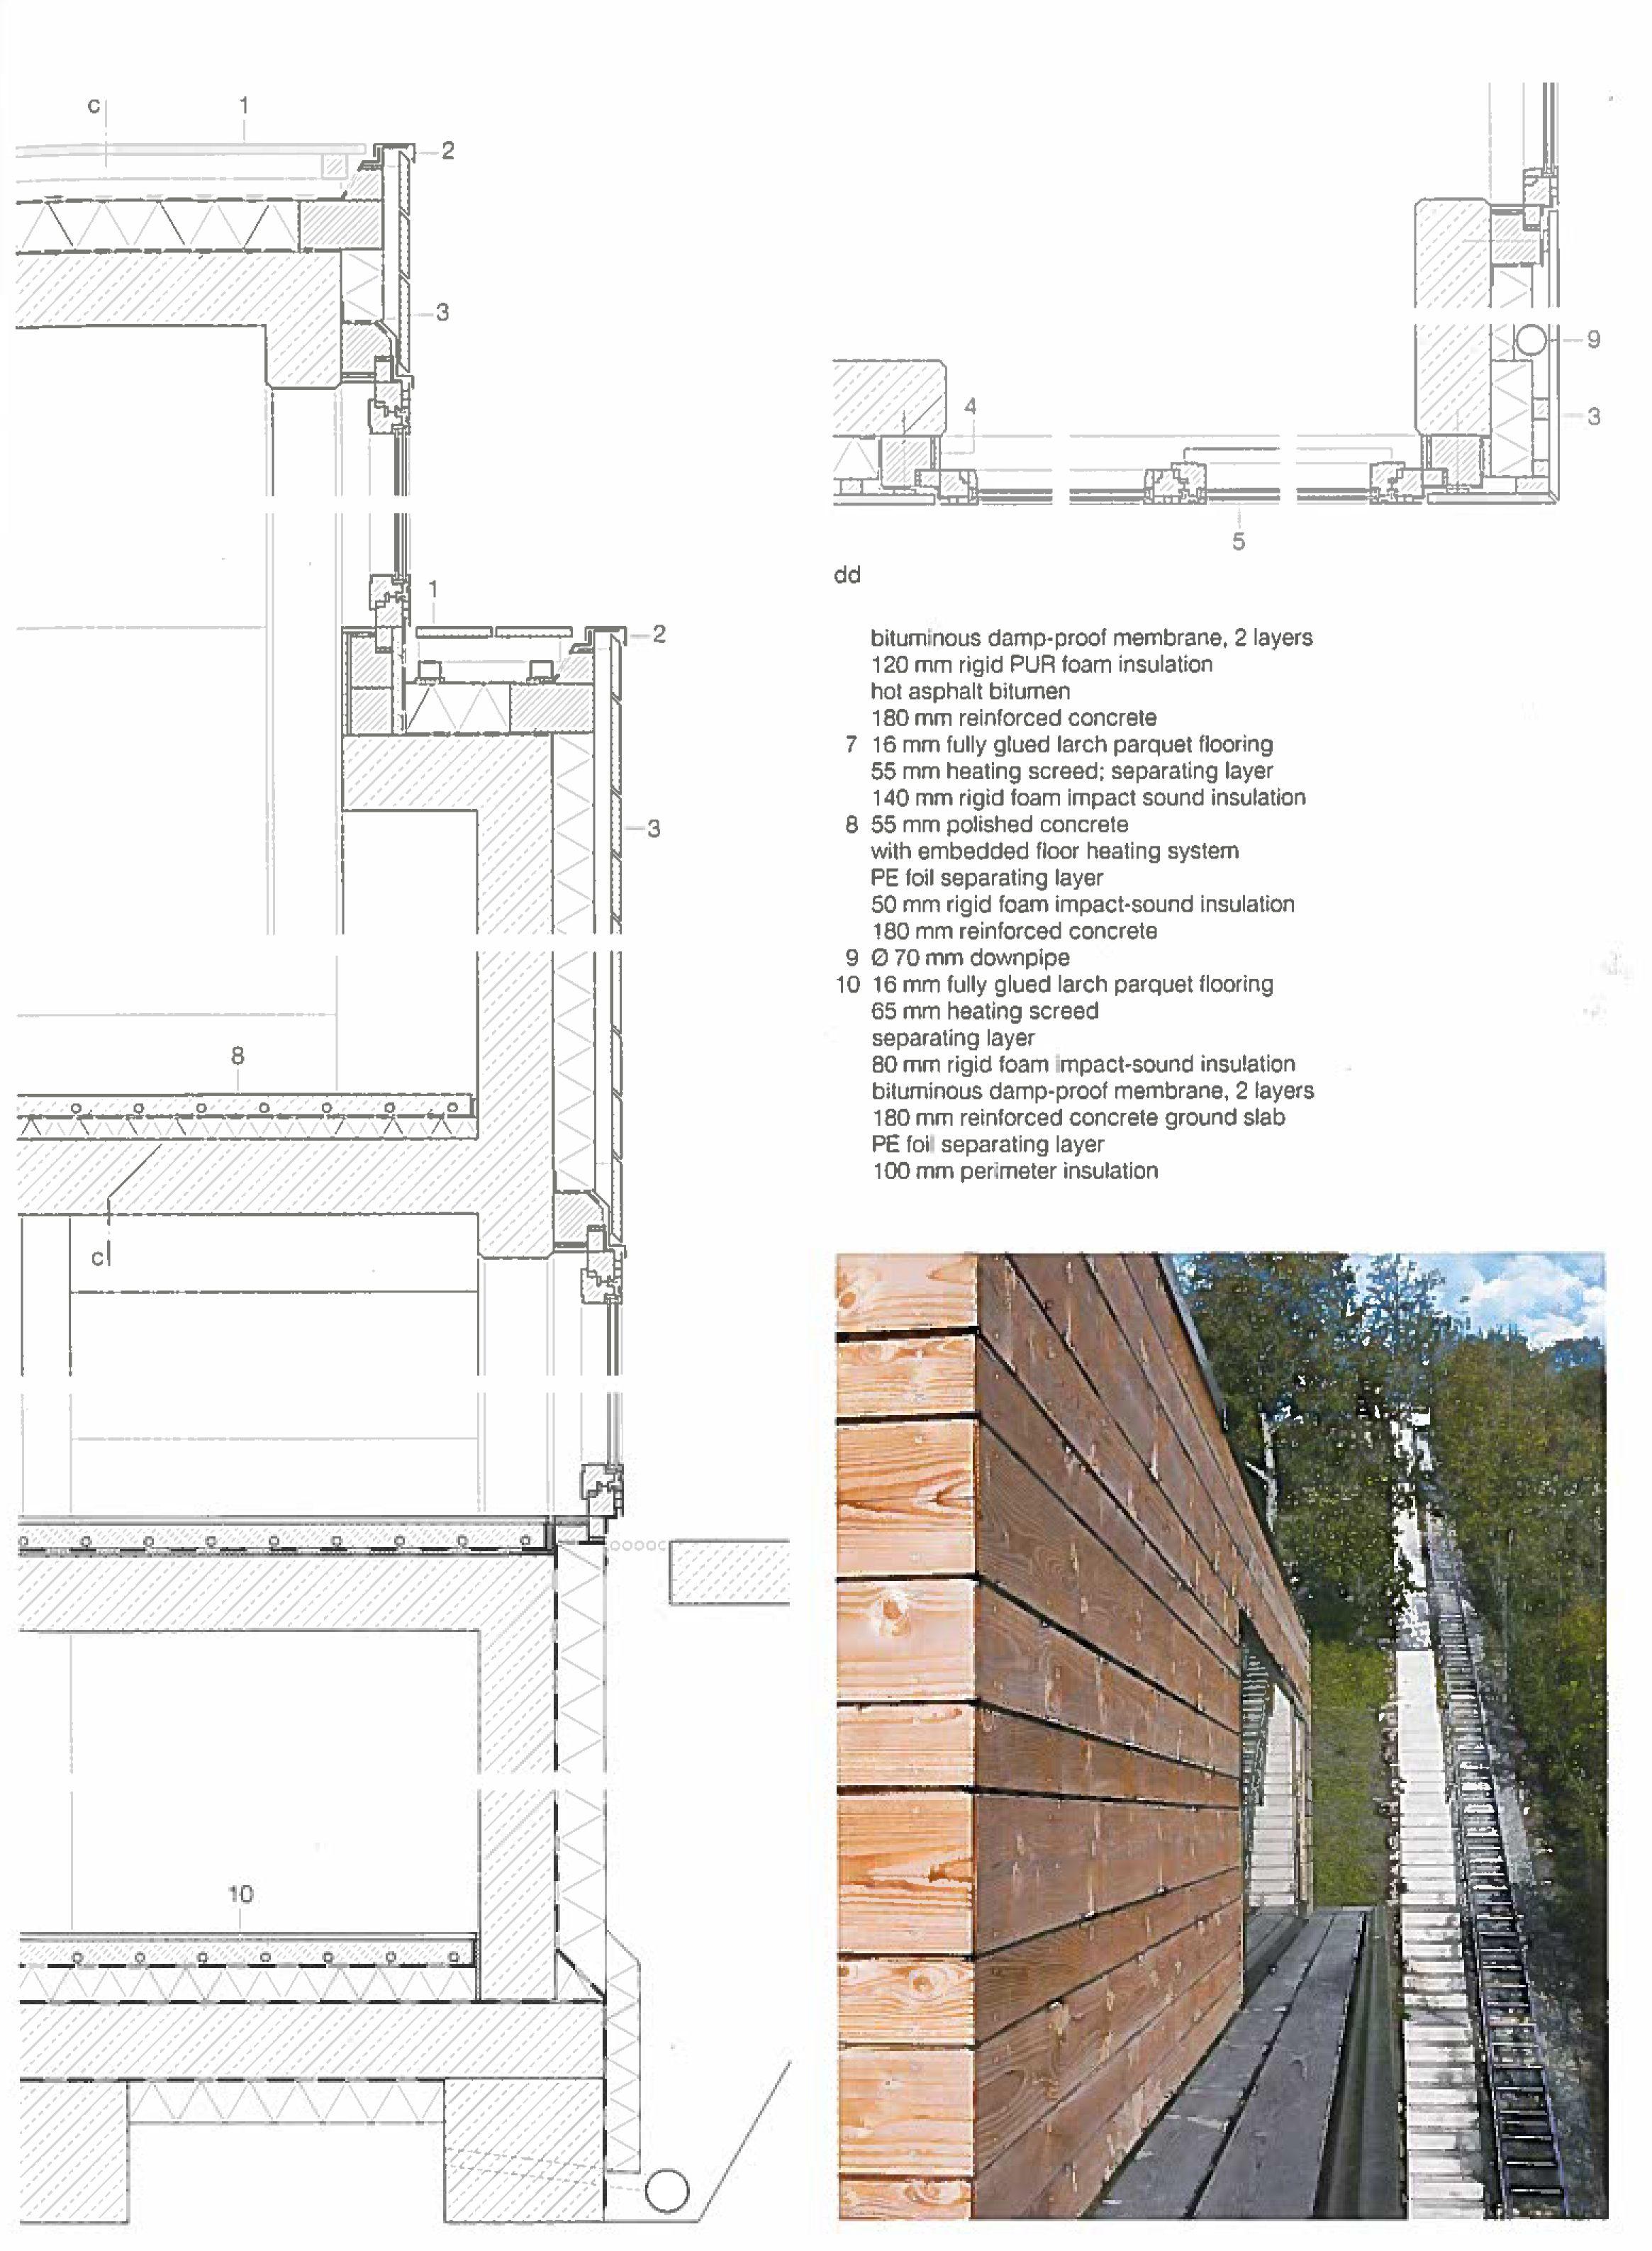 Holzfassade Detail lohman house in stuttgart detail book architektur technical